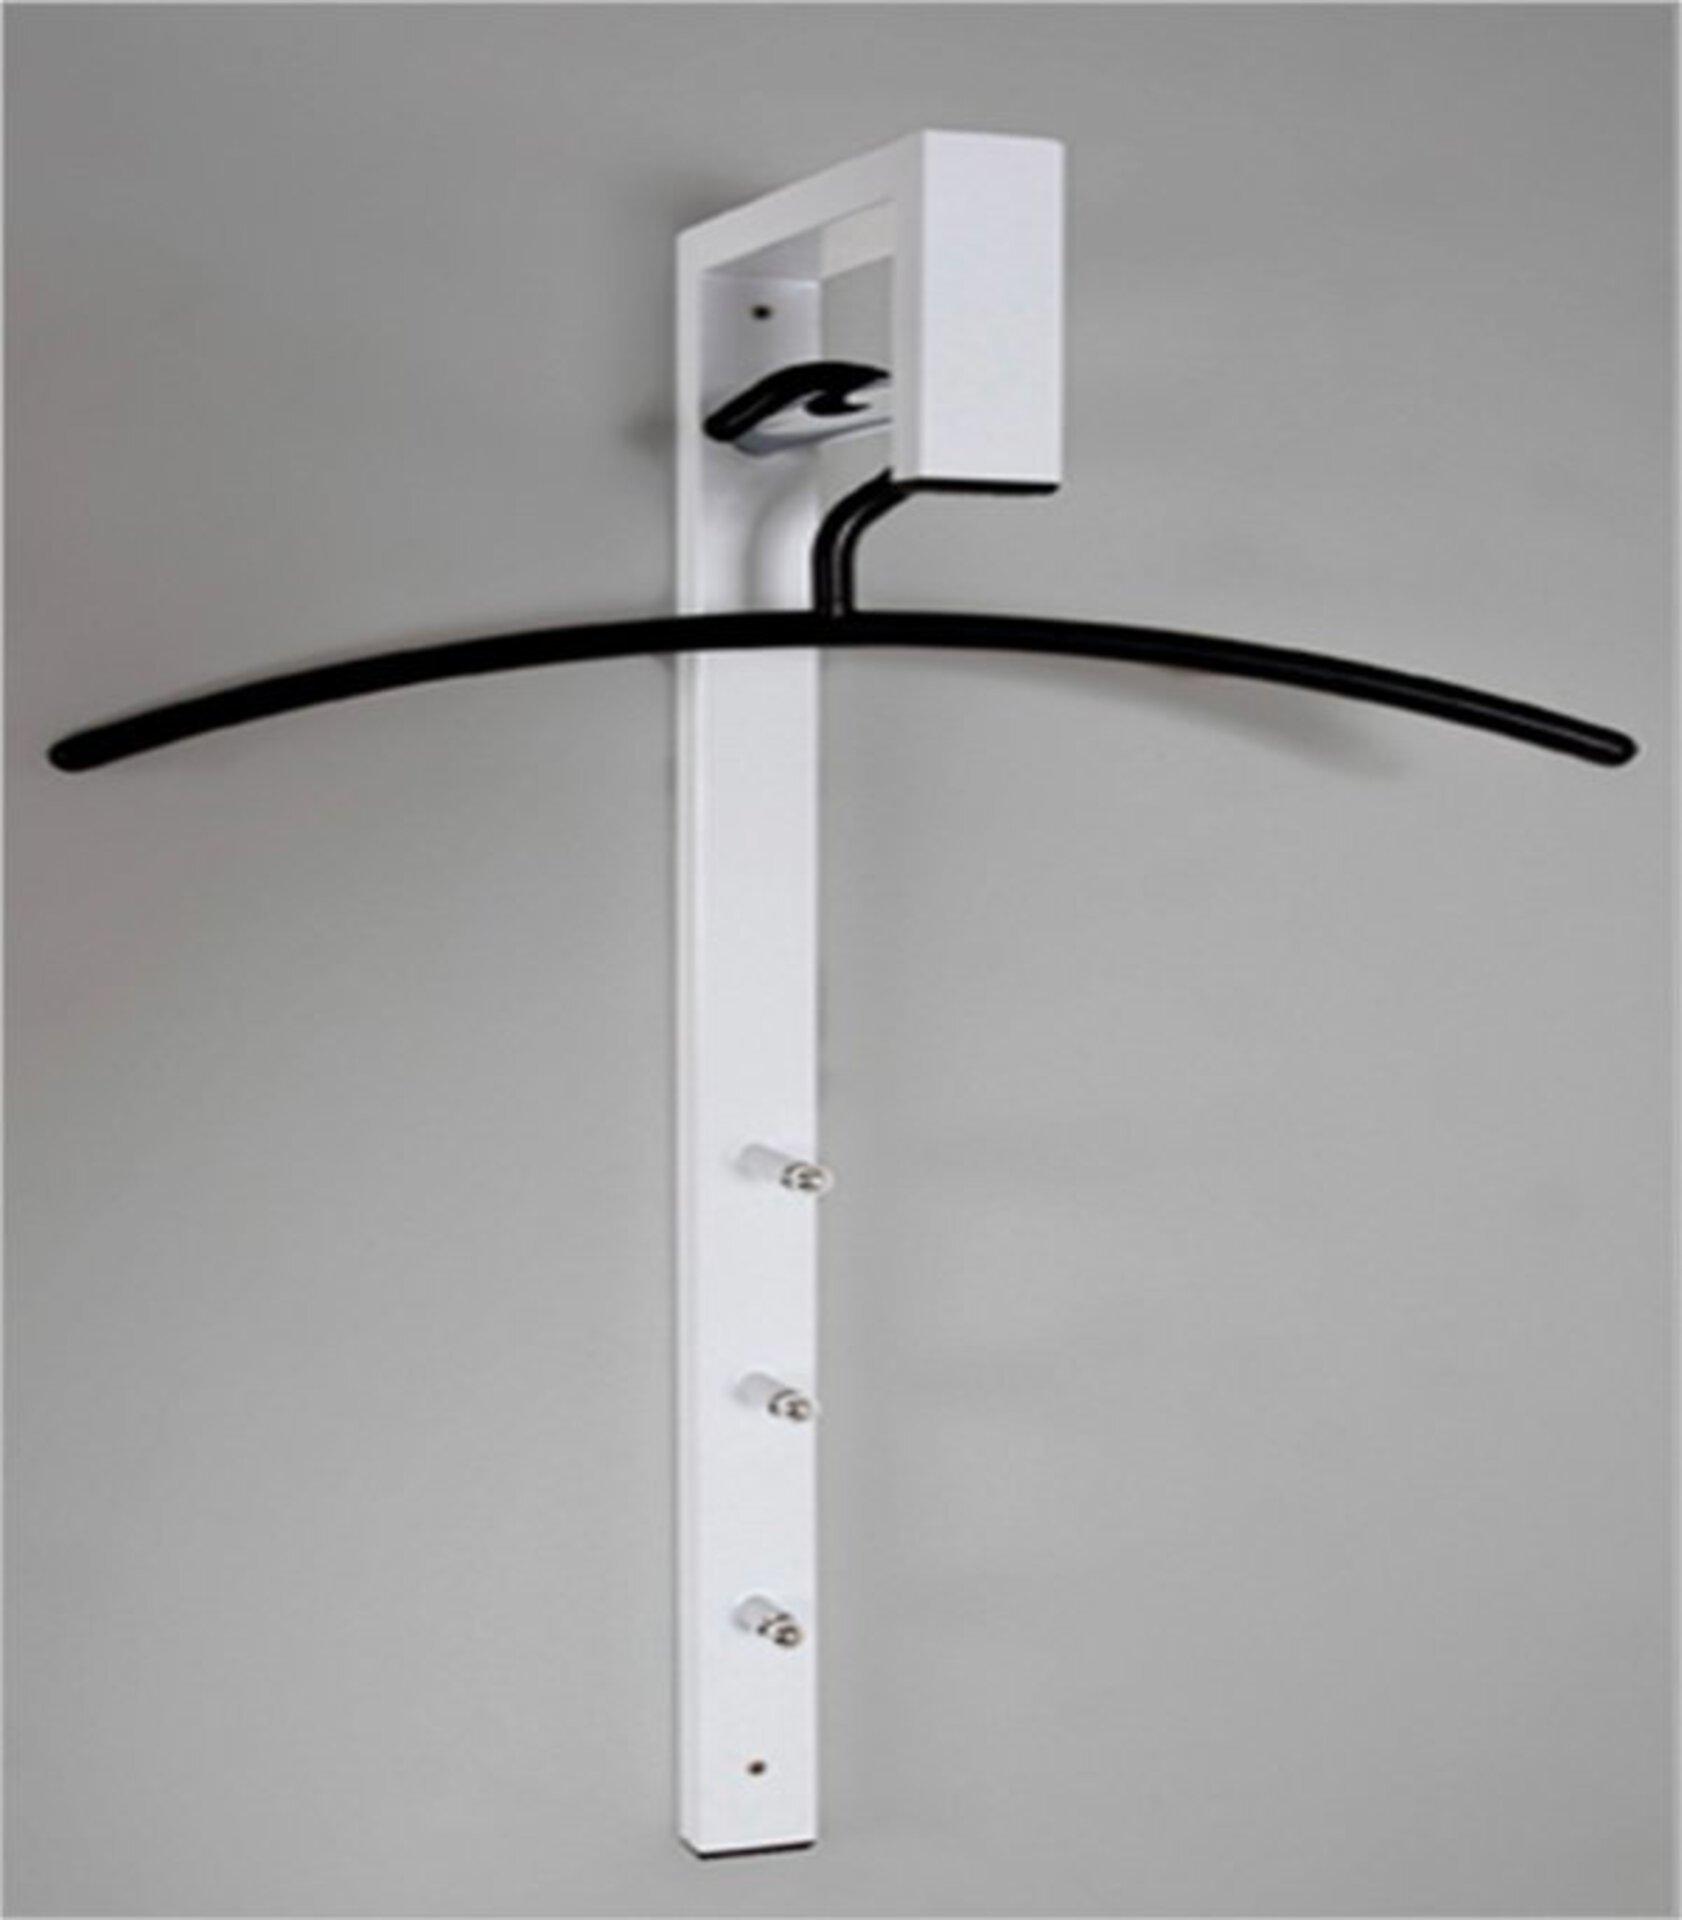 Garderobe SPIKE inbuy Holzwerkstoff 20 x 70 x 4 cm